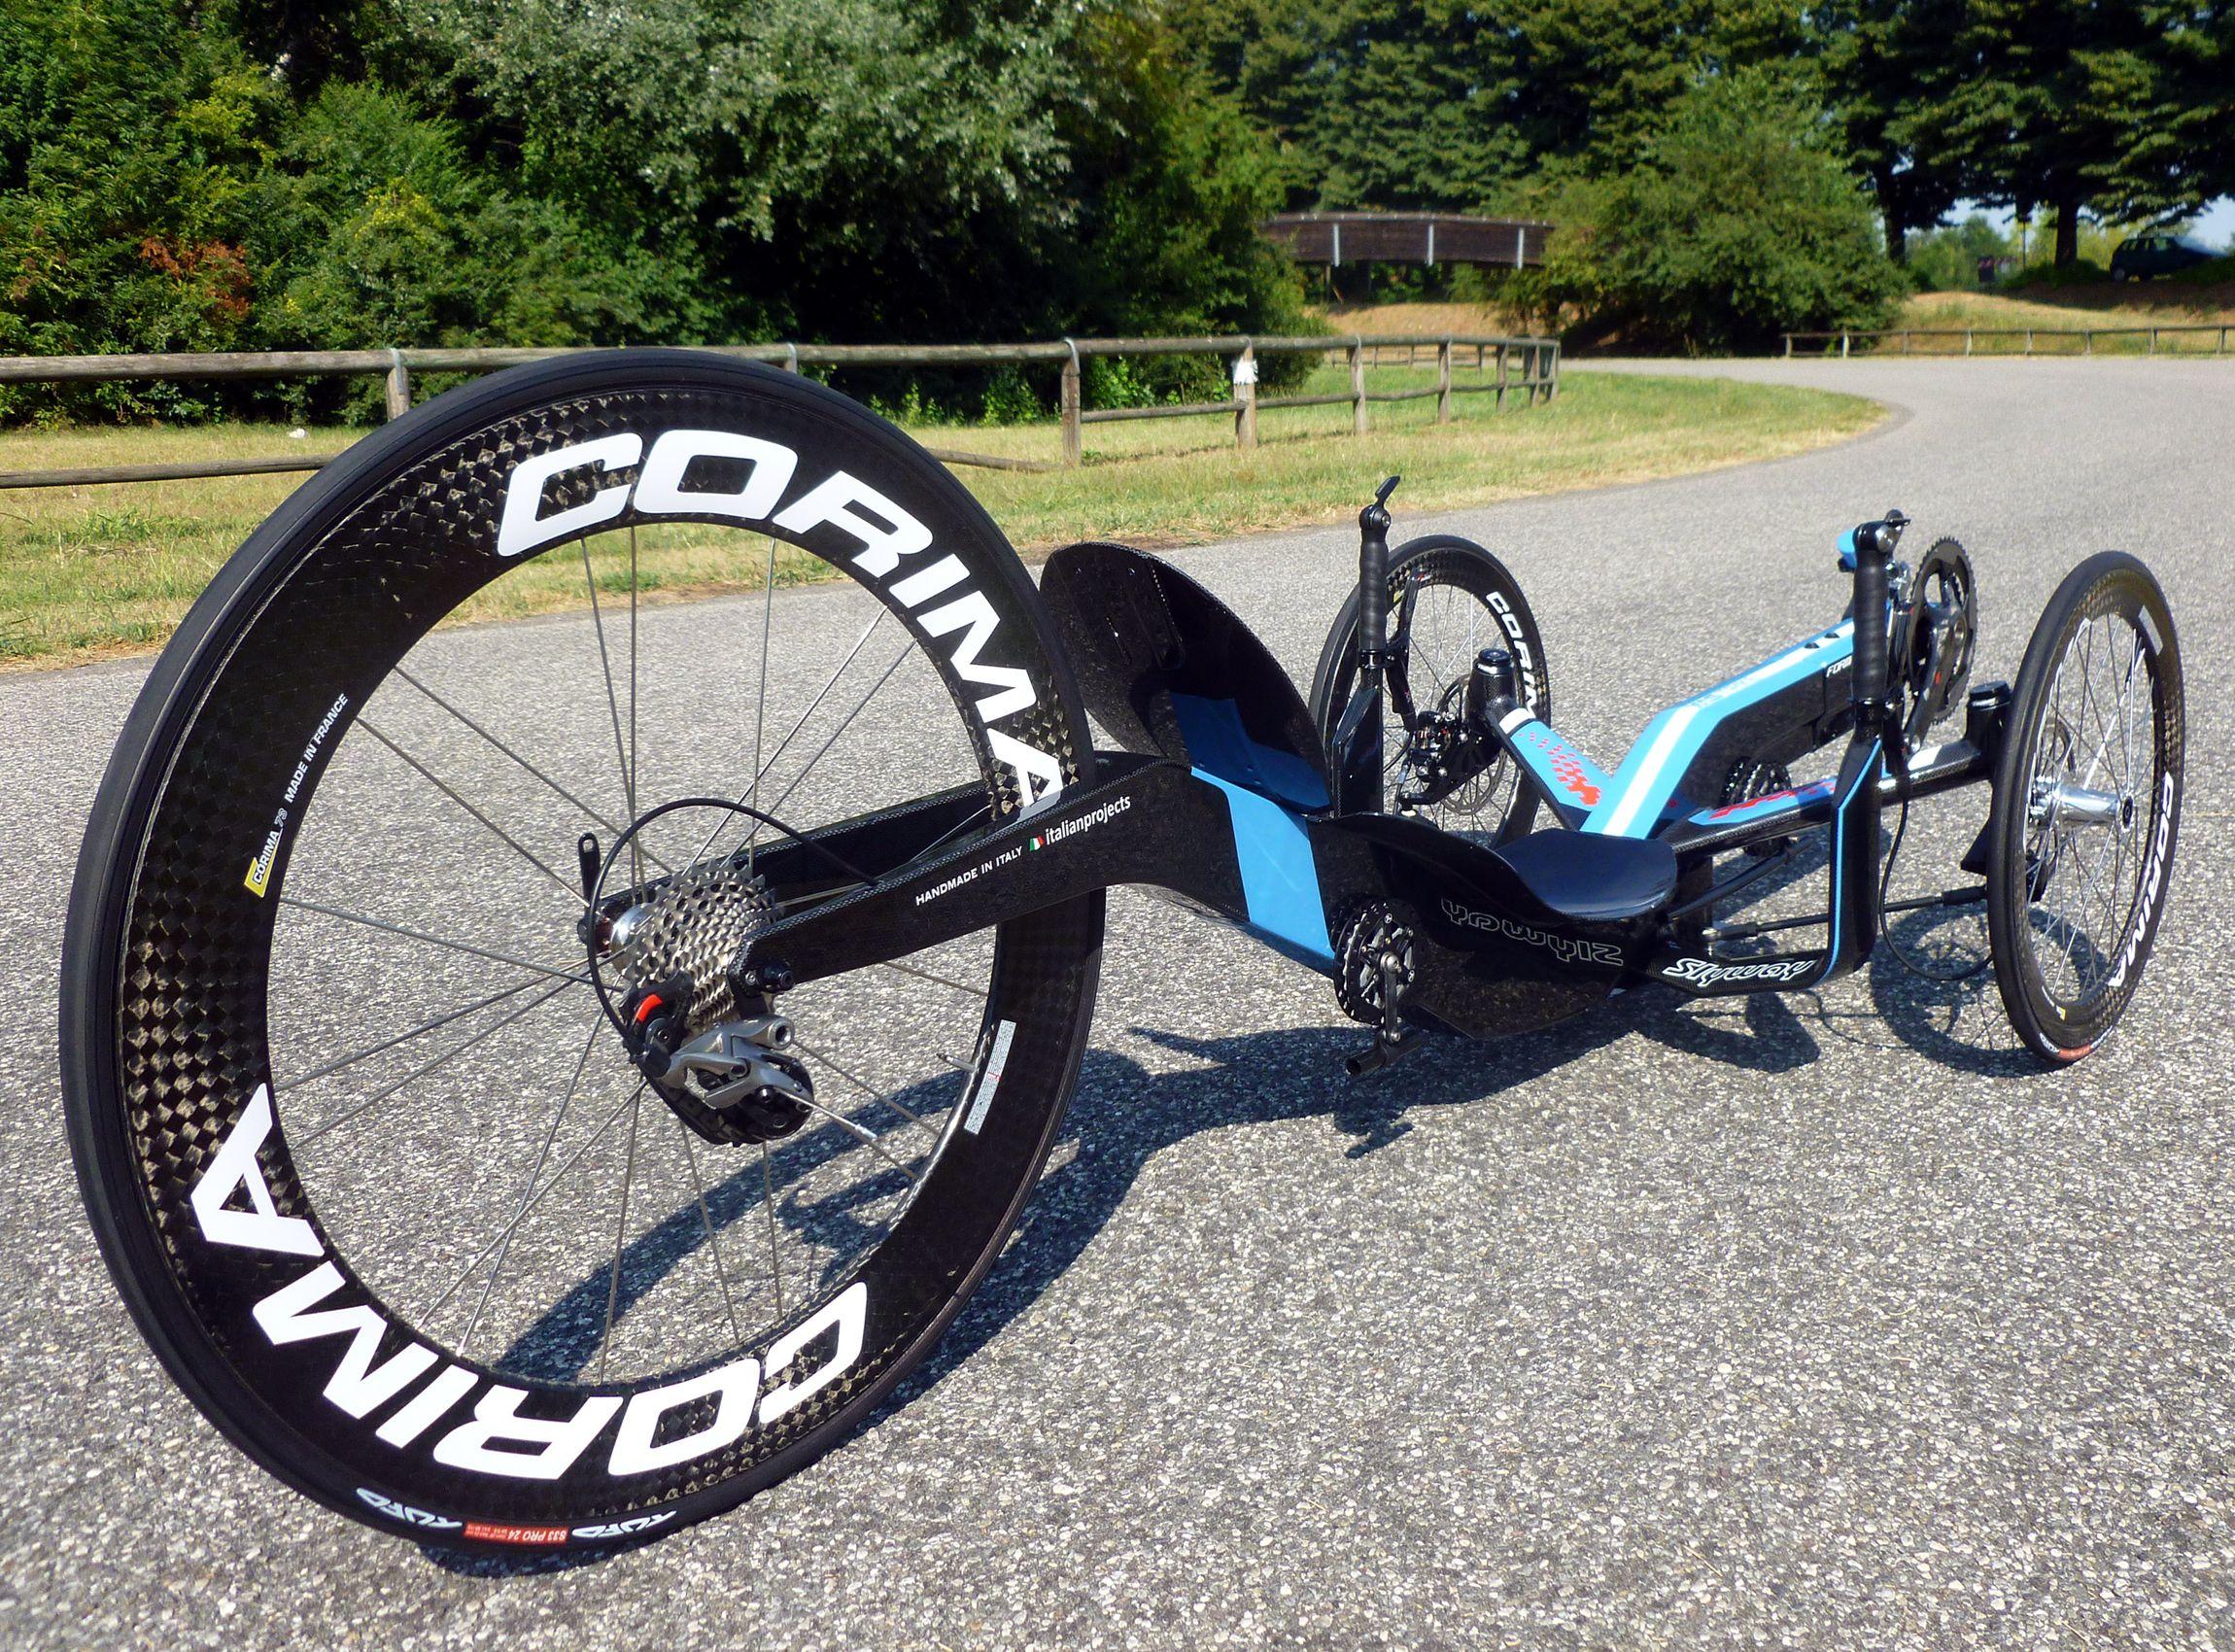 formula rc11 carbon sky blue livery 3 trike bicycle. Black Bedroom Furniture Sets. Home Design Ideas